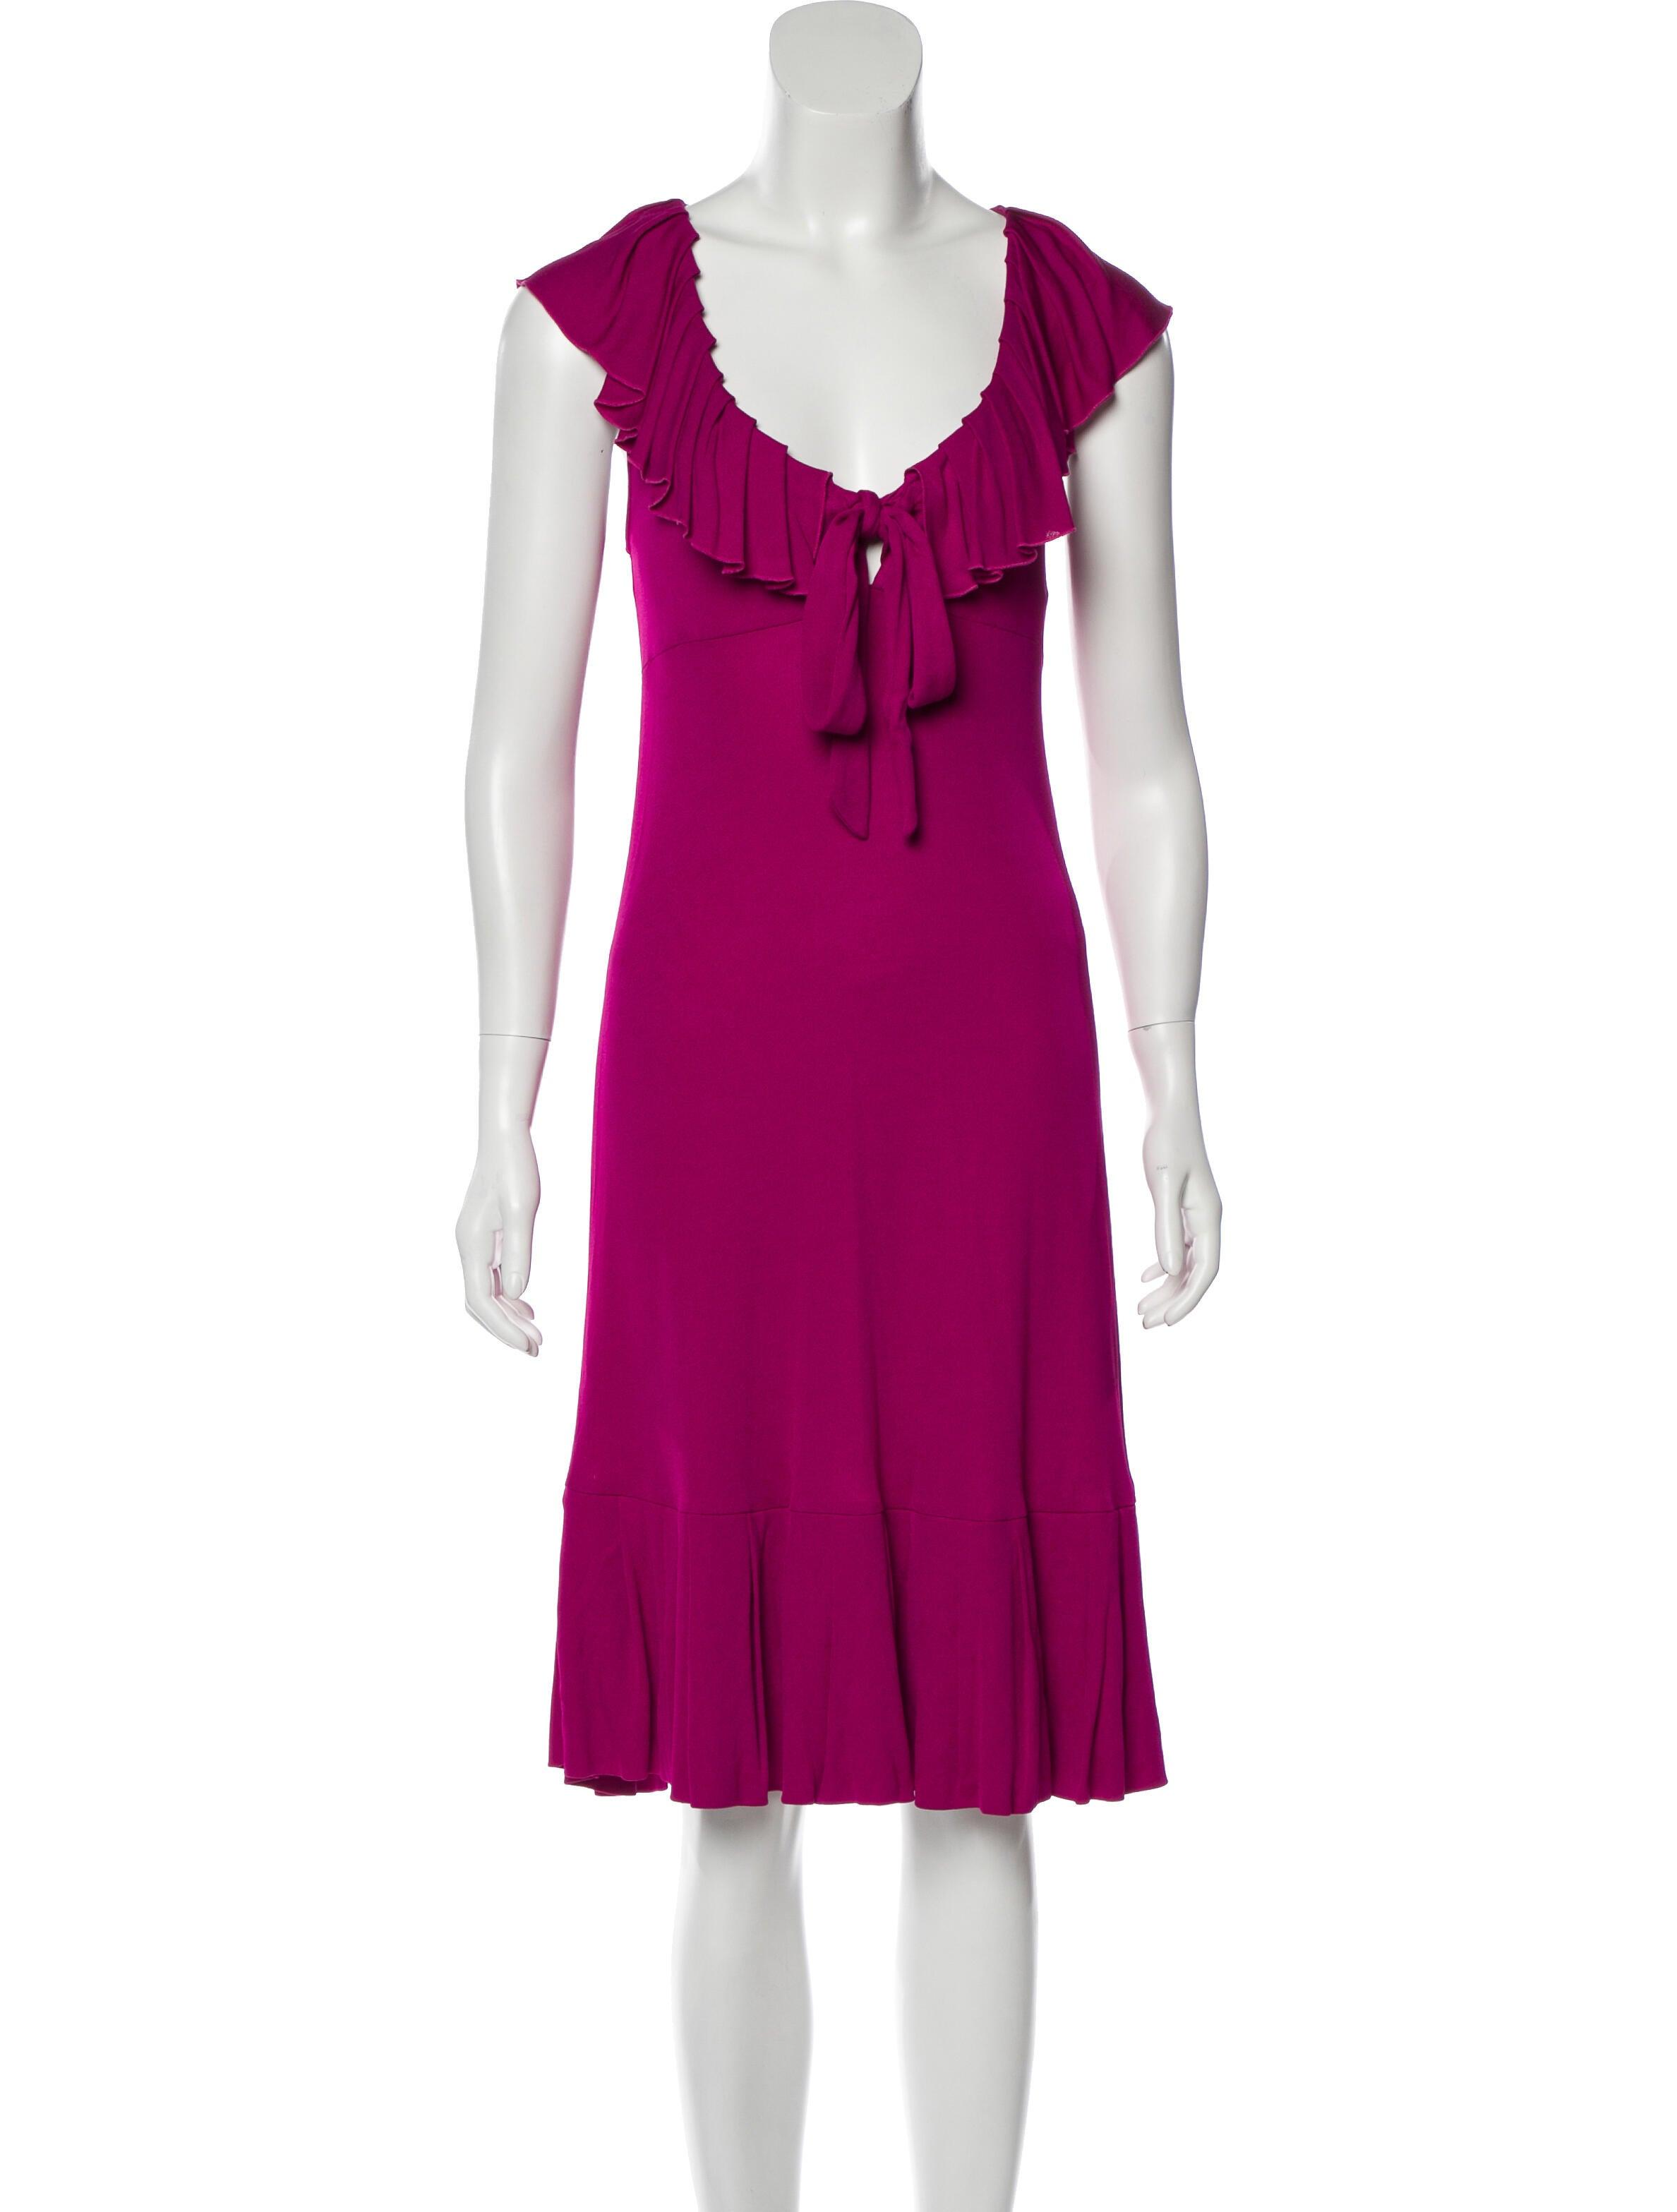 Diane von Furstenberg Baila Knee-Length Dress - Clothing -           WDI235425 | The RealReal